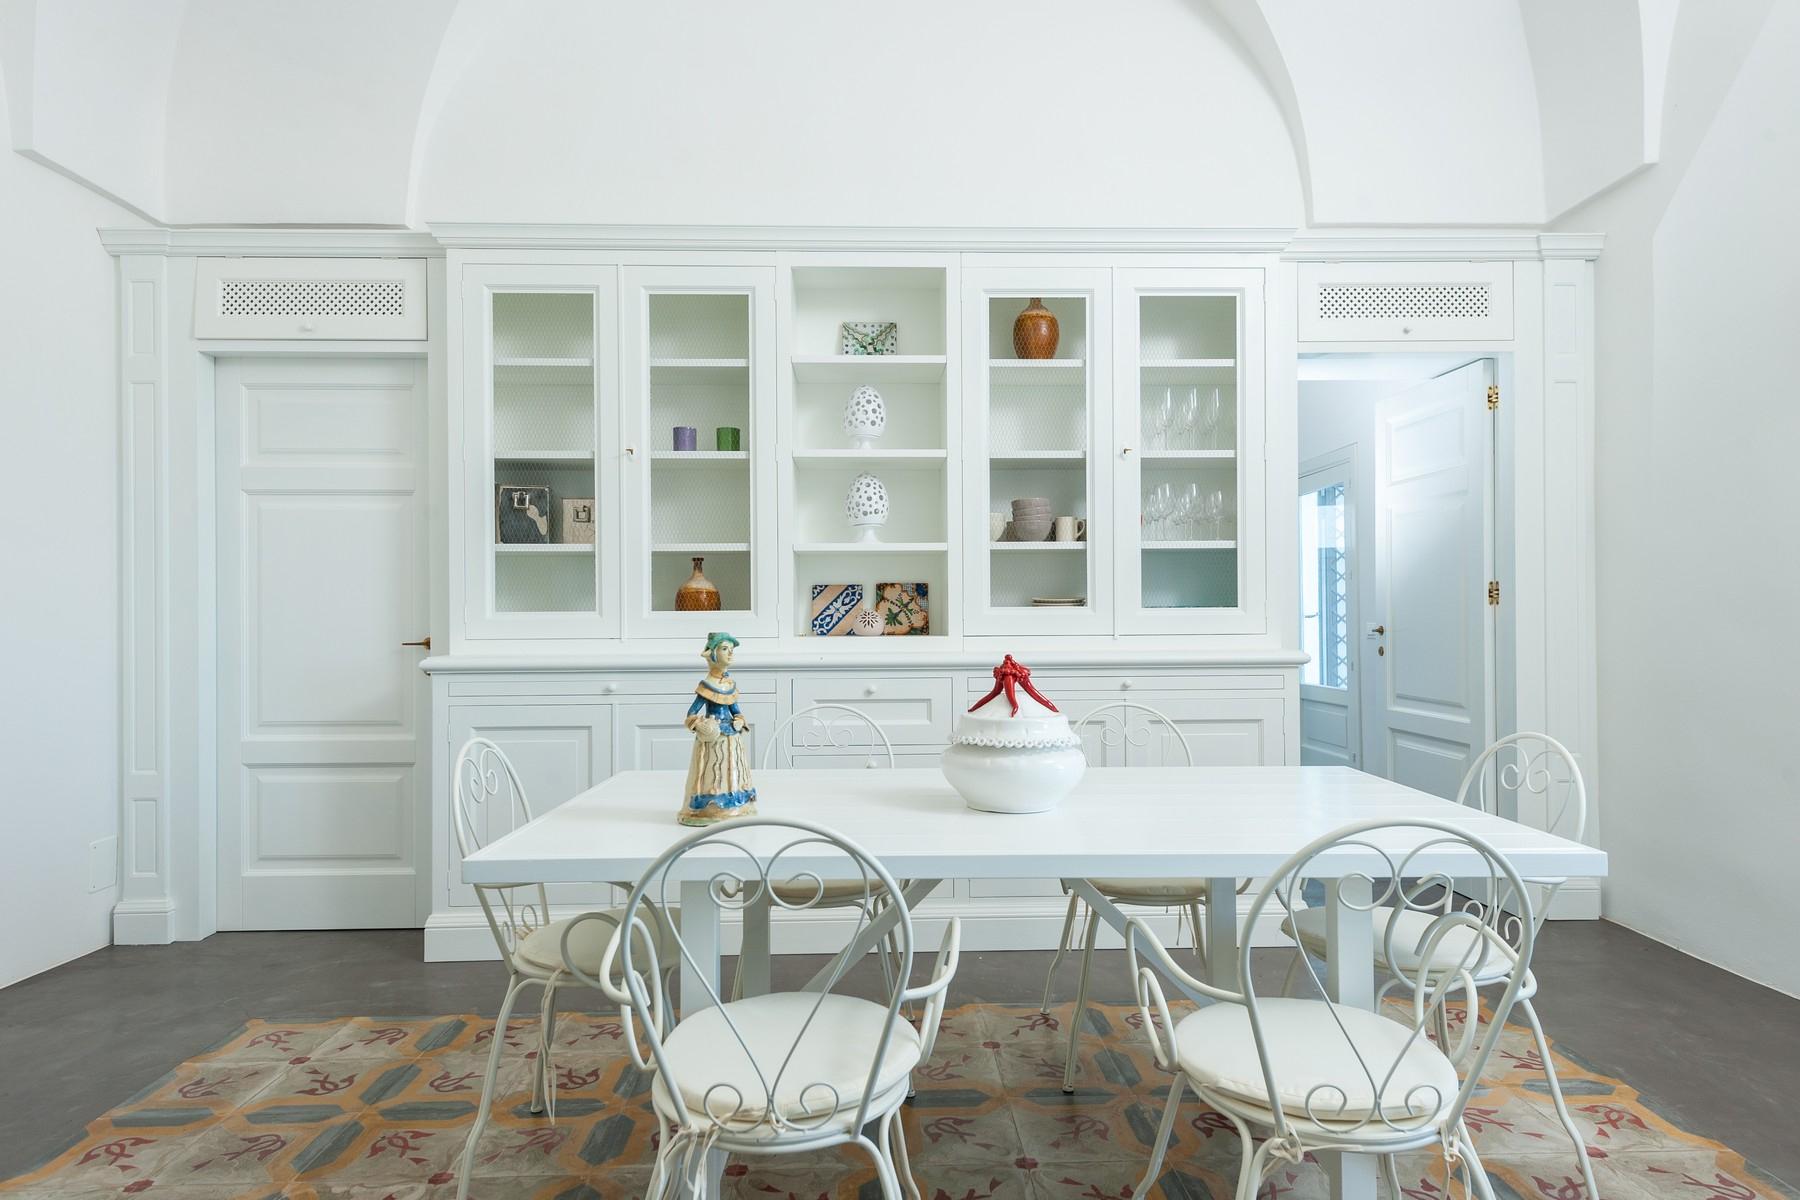 Appartamento in Vendita a Ostuni: 5 locali, 265 mq - Foto 4